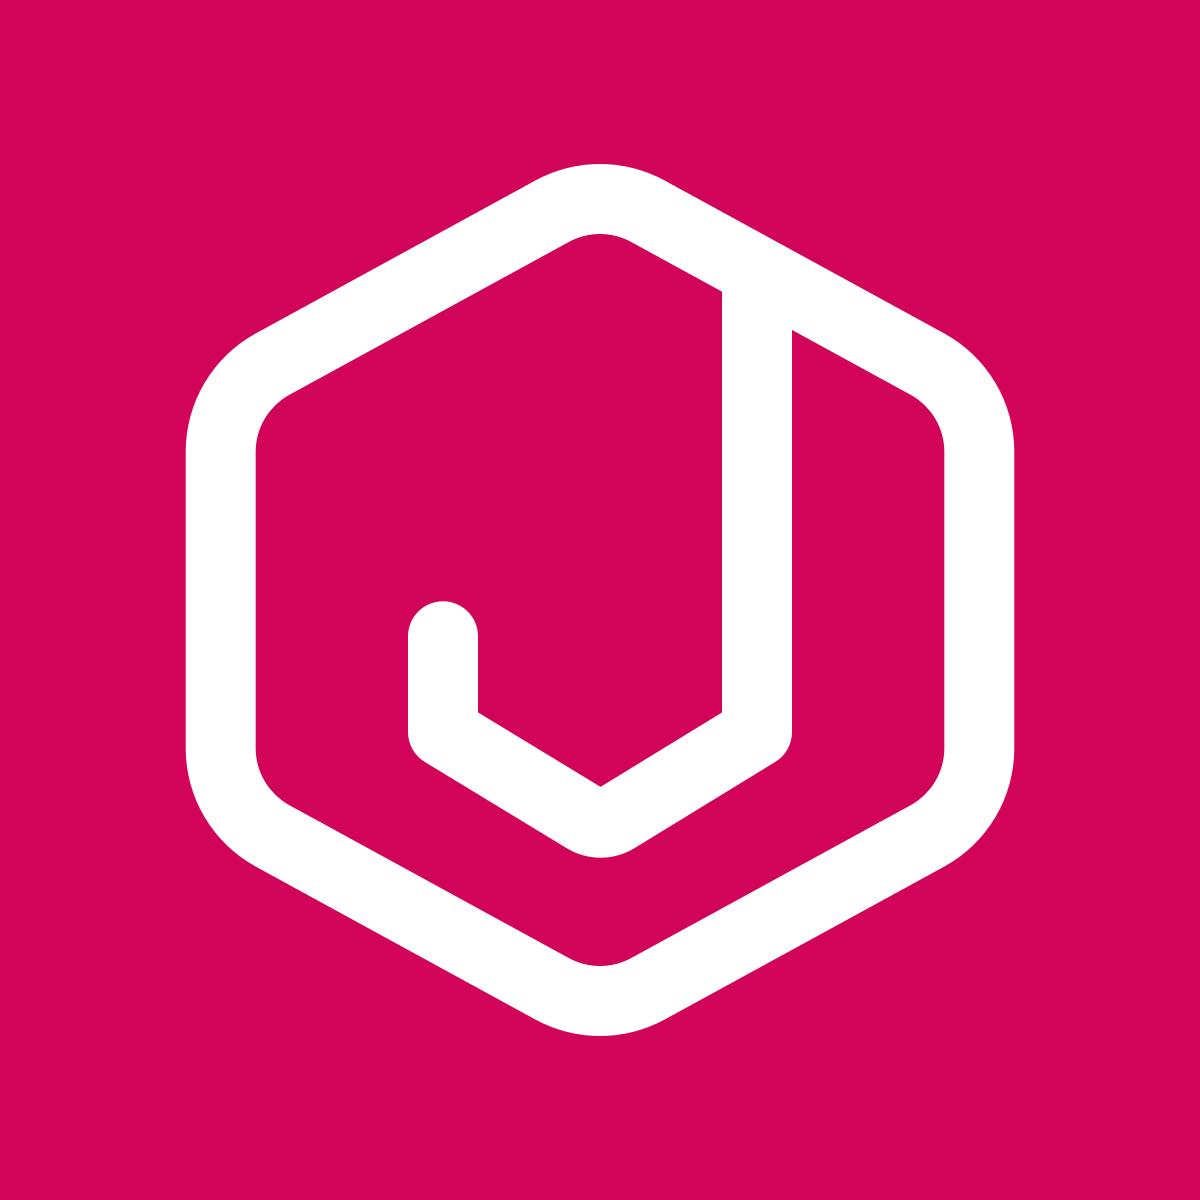 Shopify Mobile app builder app by Jcurve